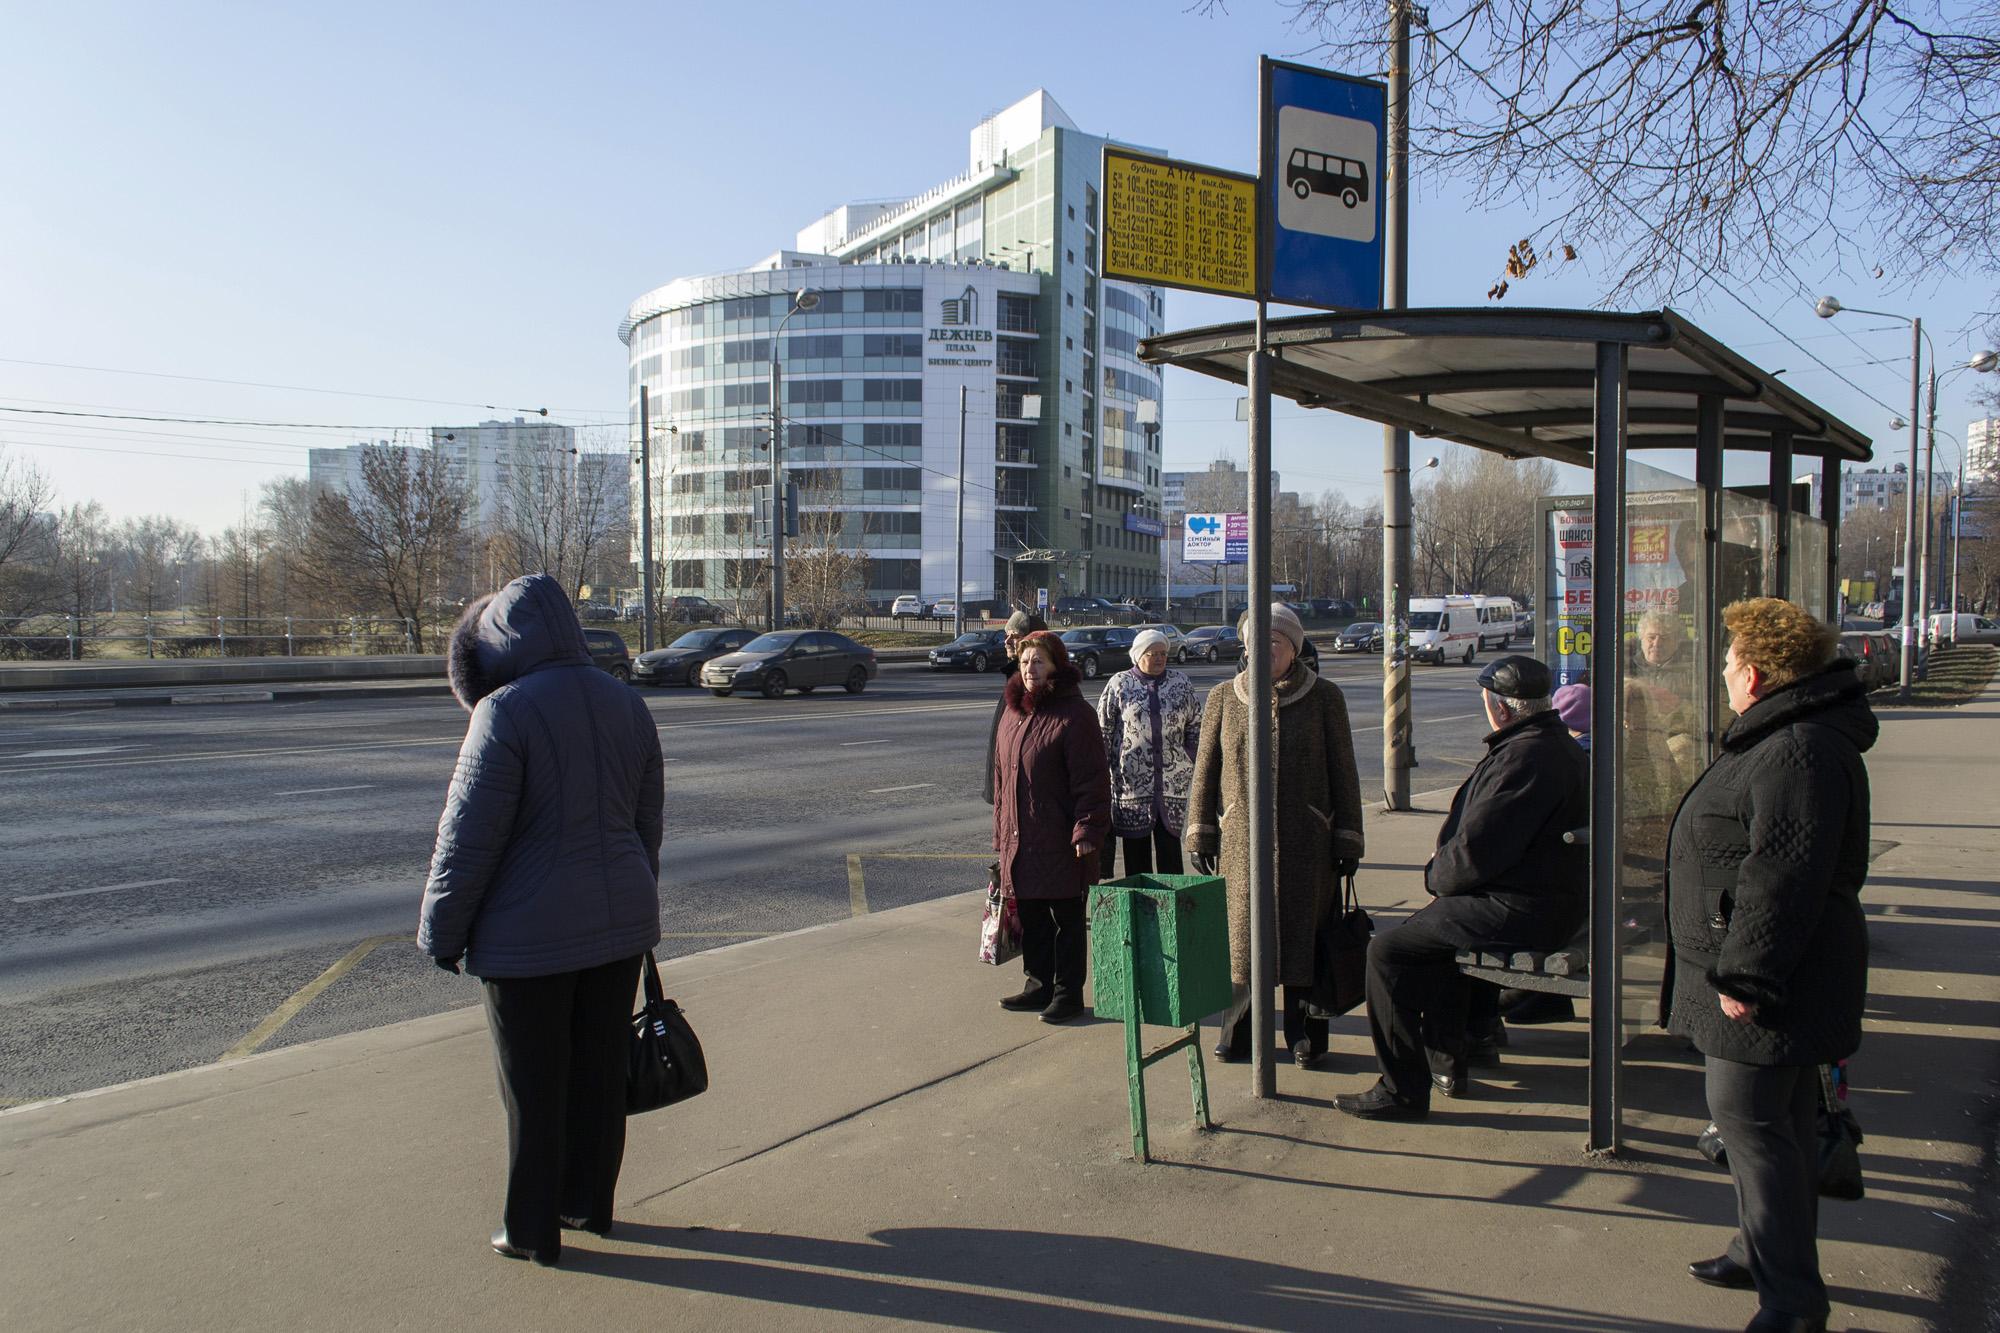 Магазин продукты, метро бабушкинская - яндекскарты